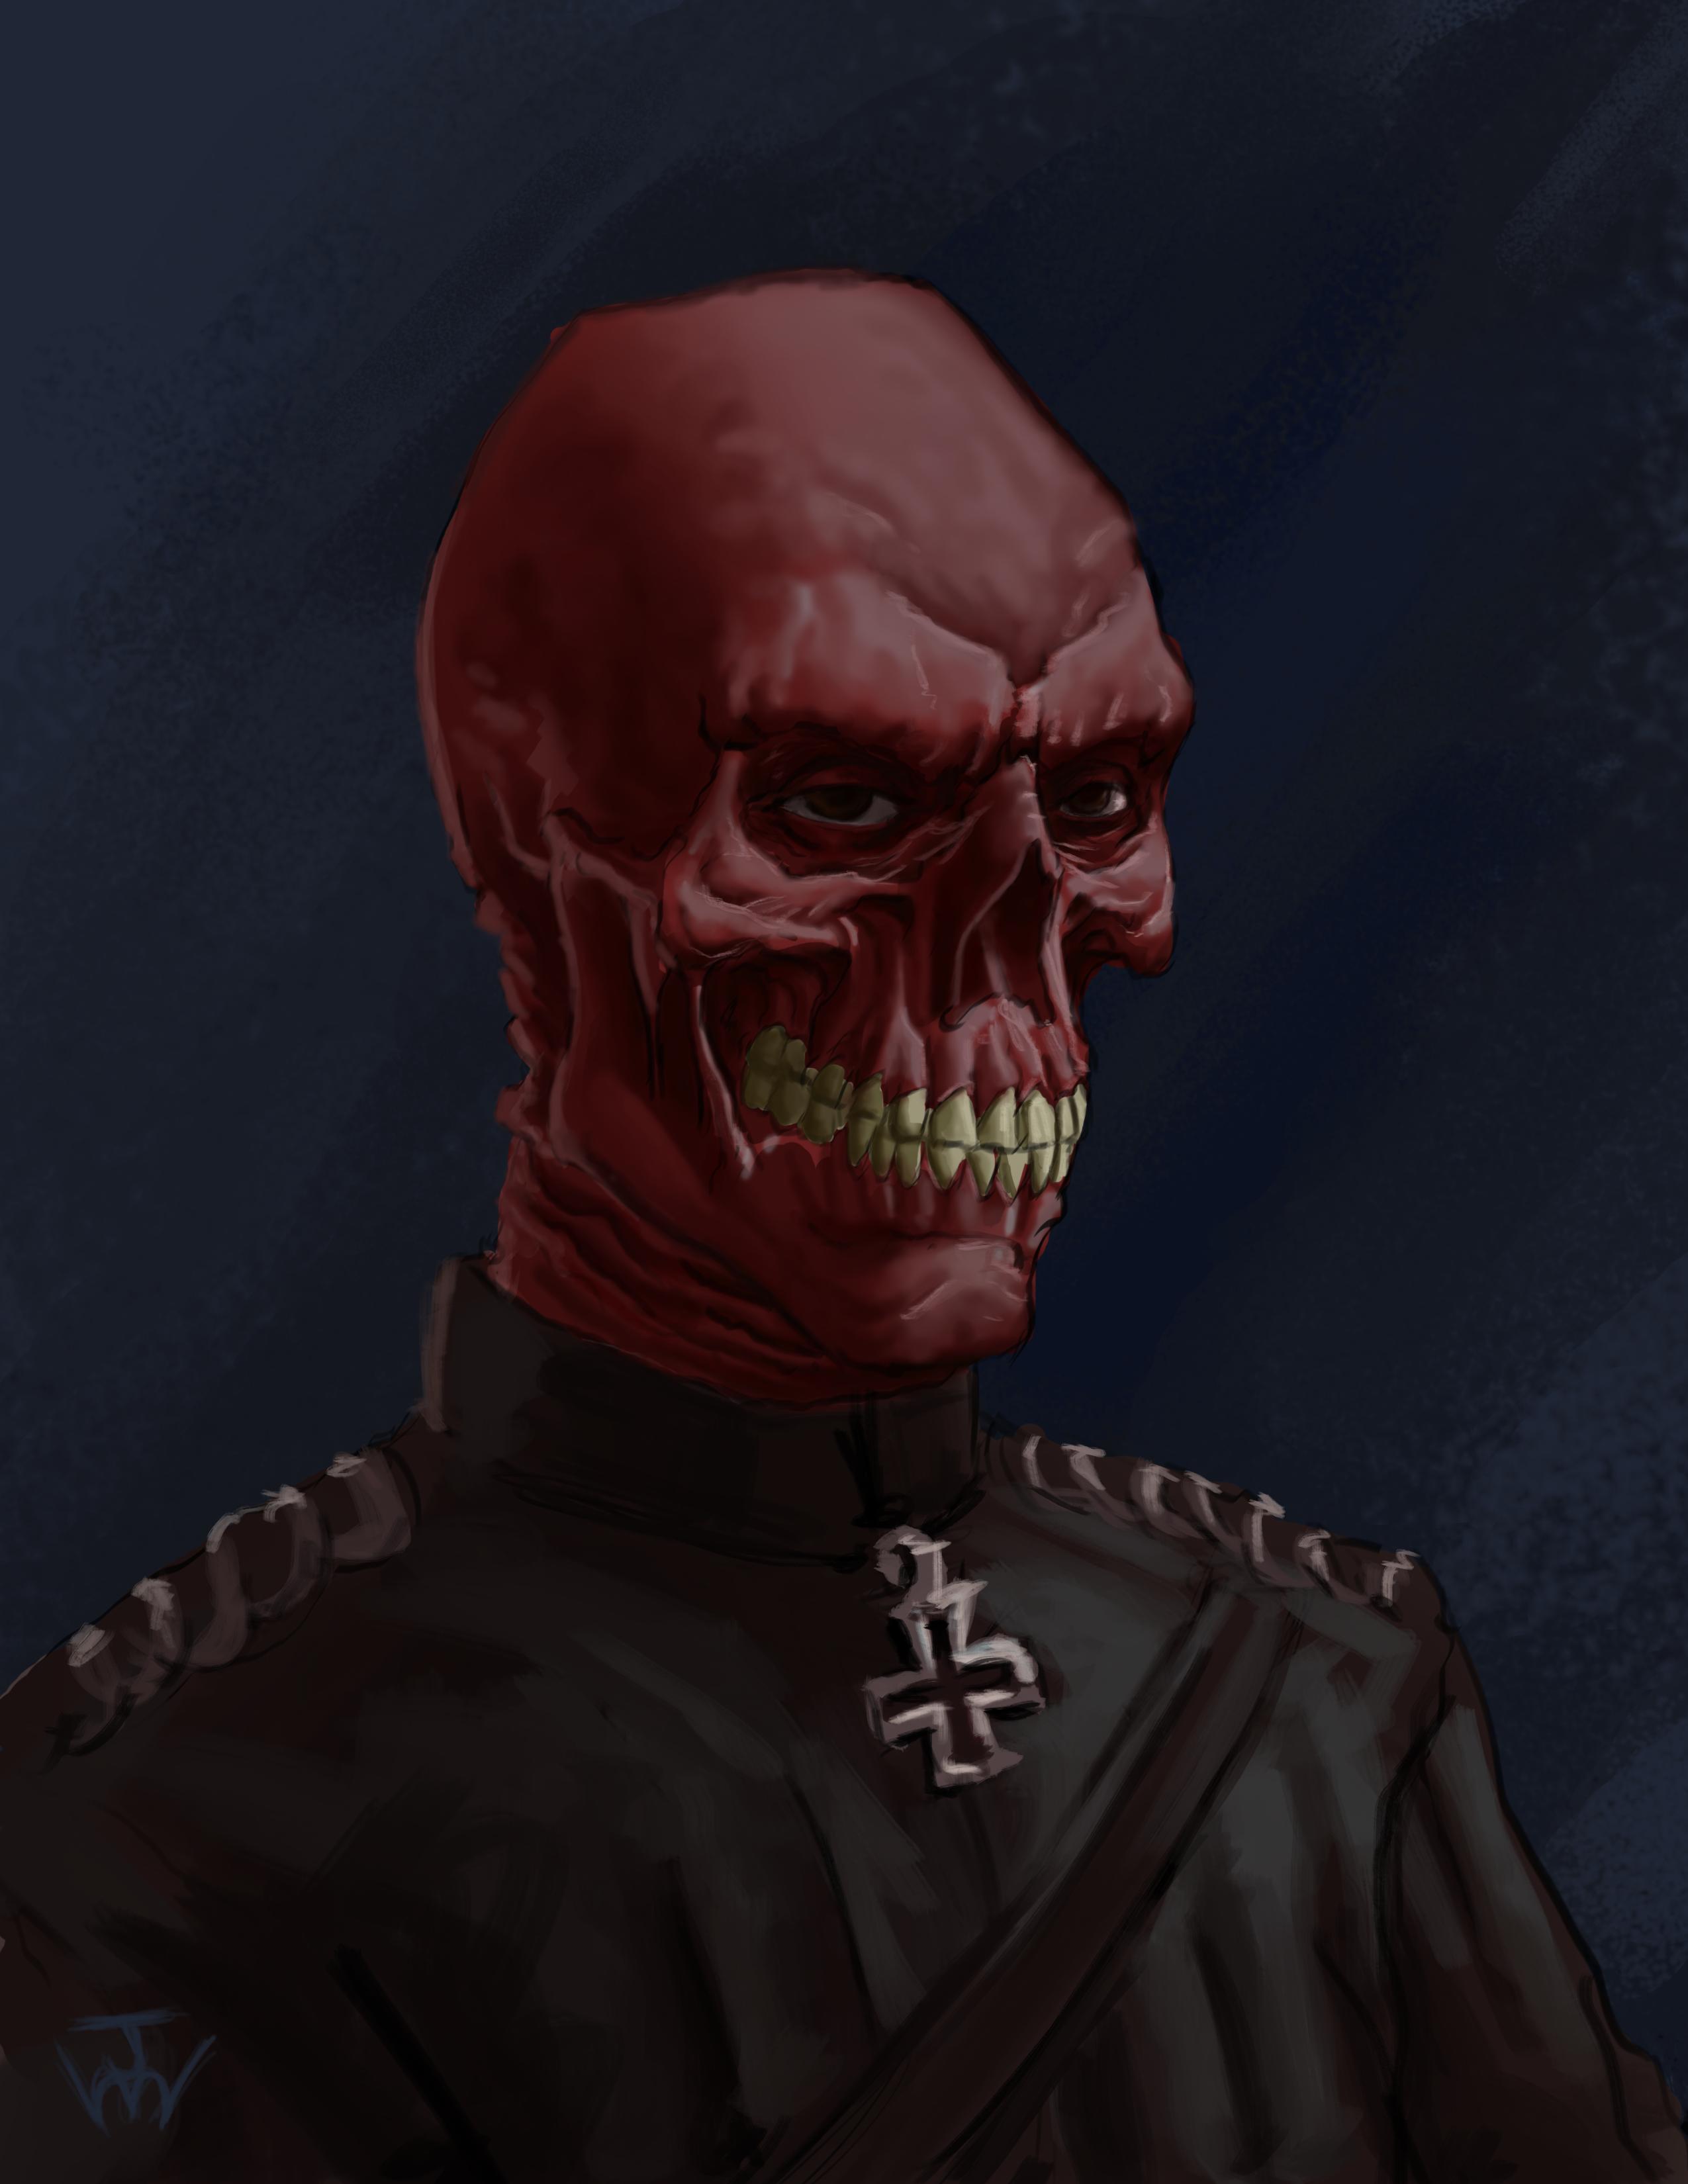 Red Skull Sketch Skull Sketch Red Skull Skull